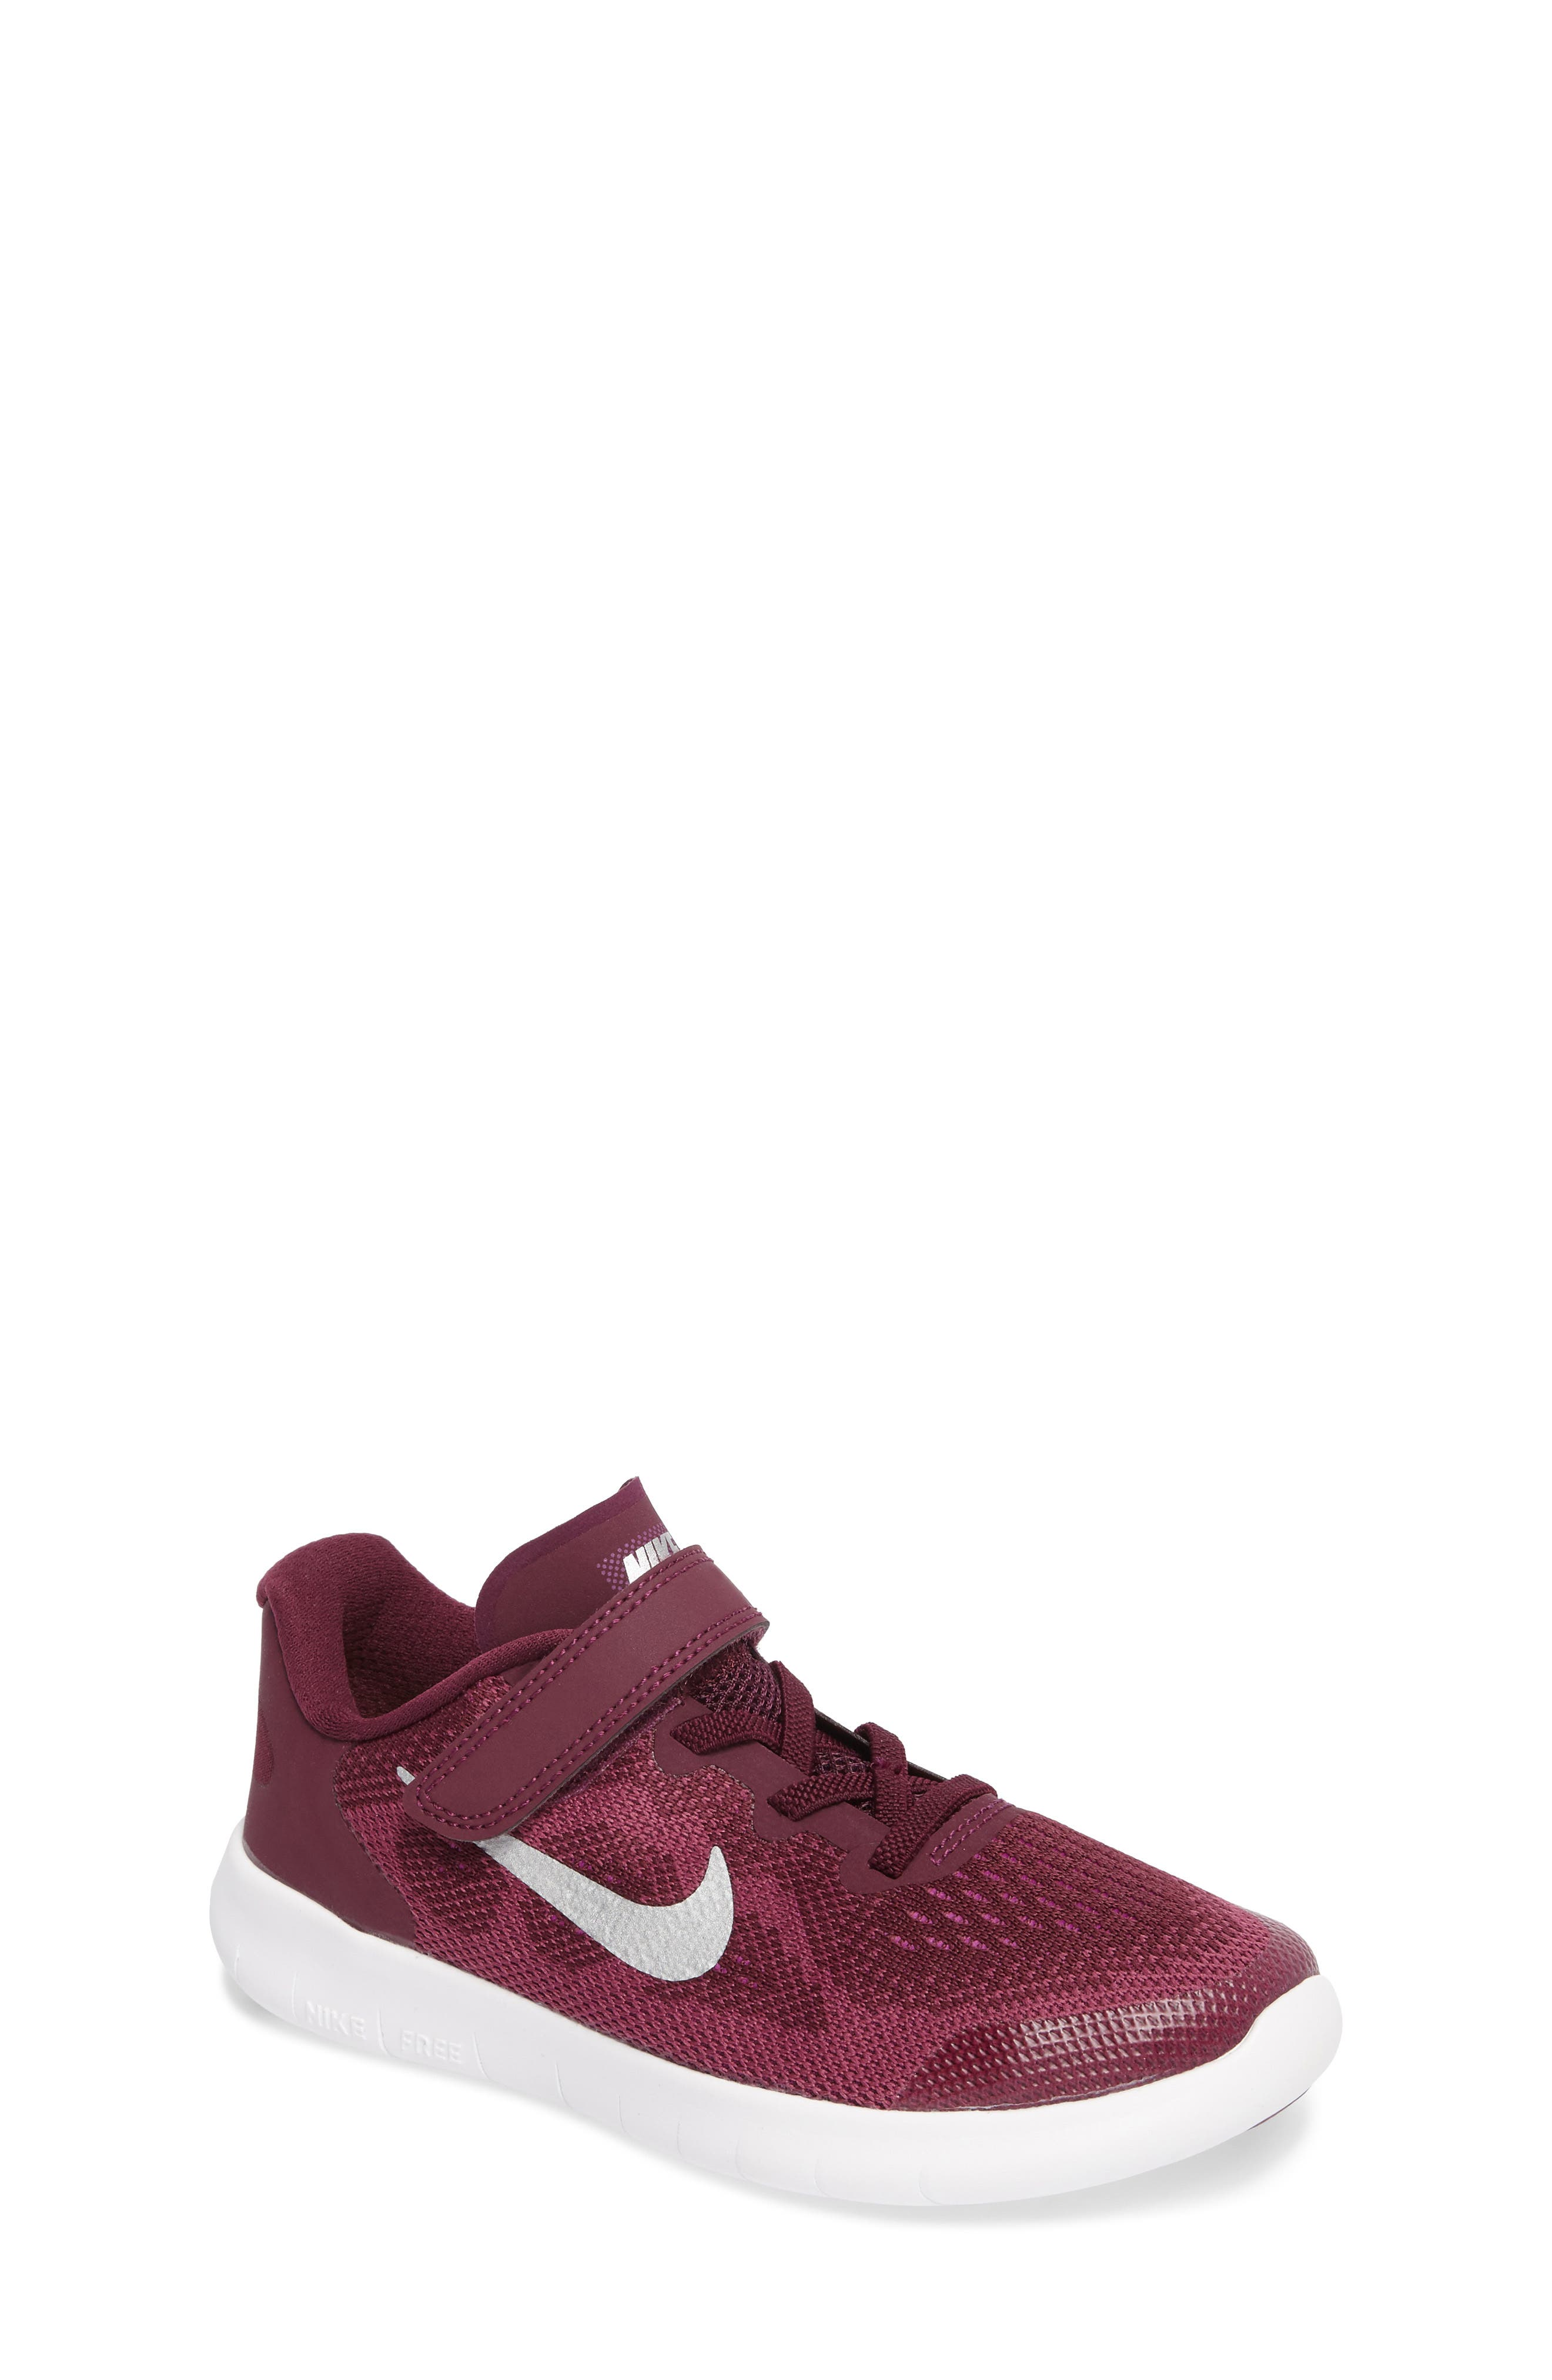 Free Run 2017 Sneaker,                             Main thumbnail 5, color,